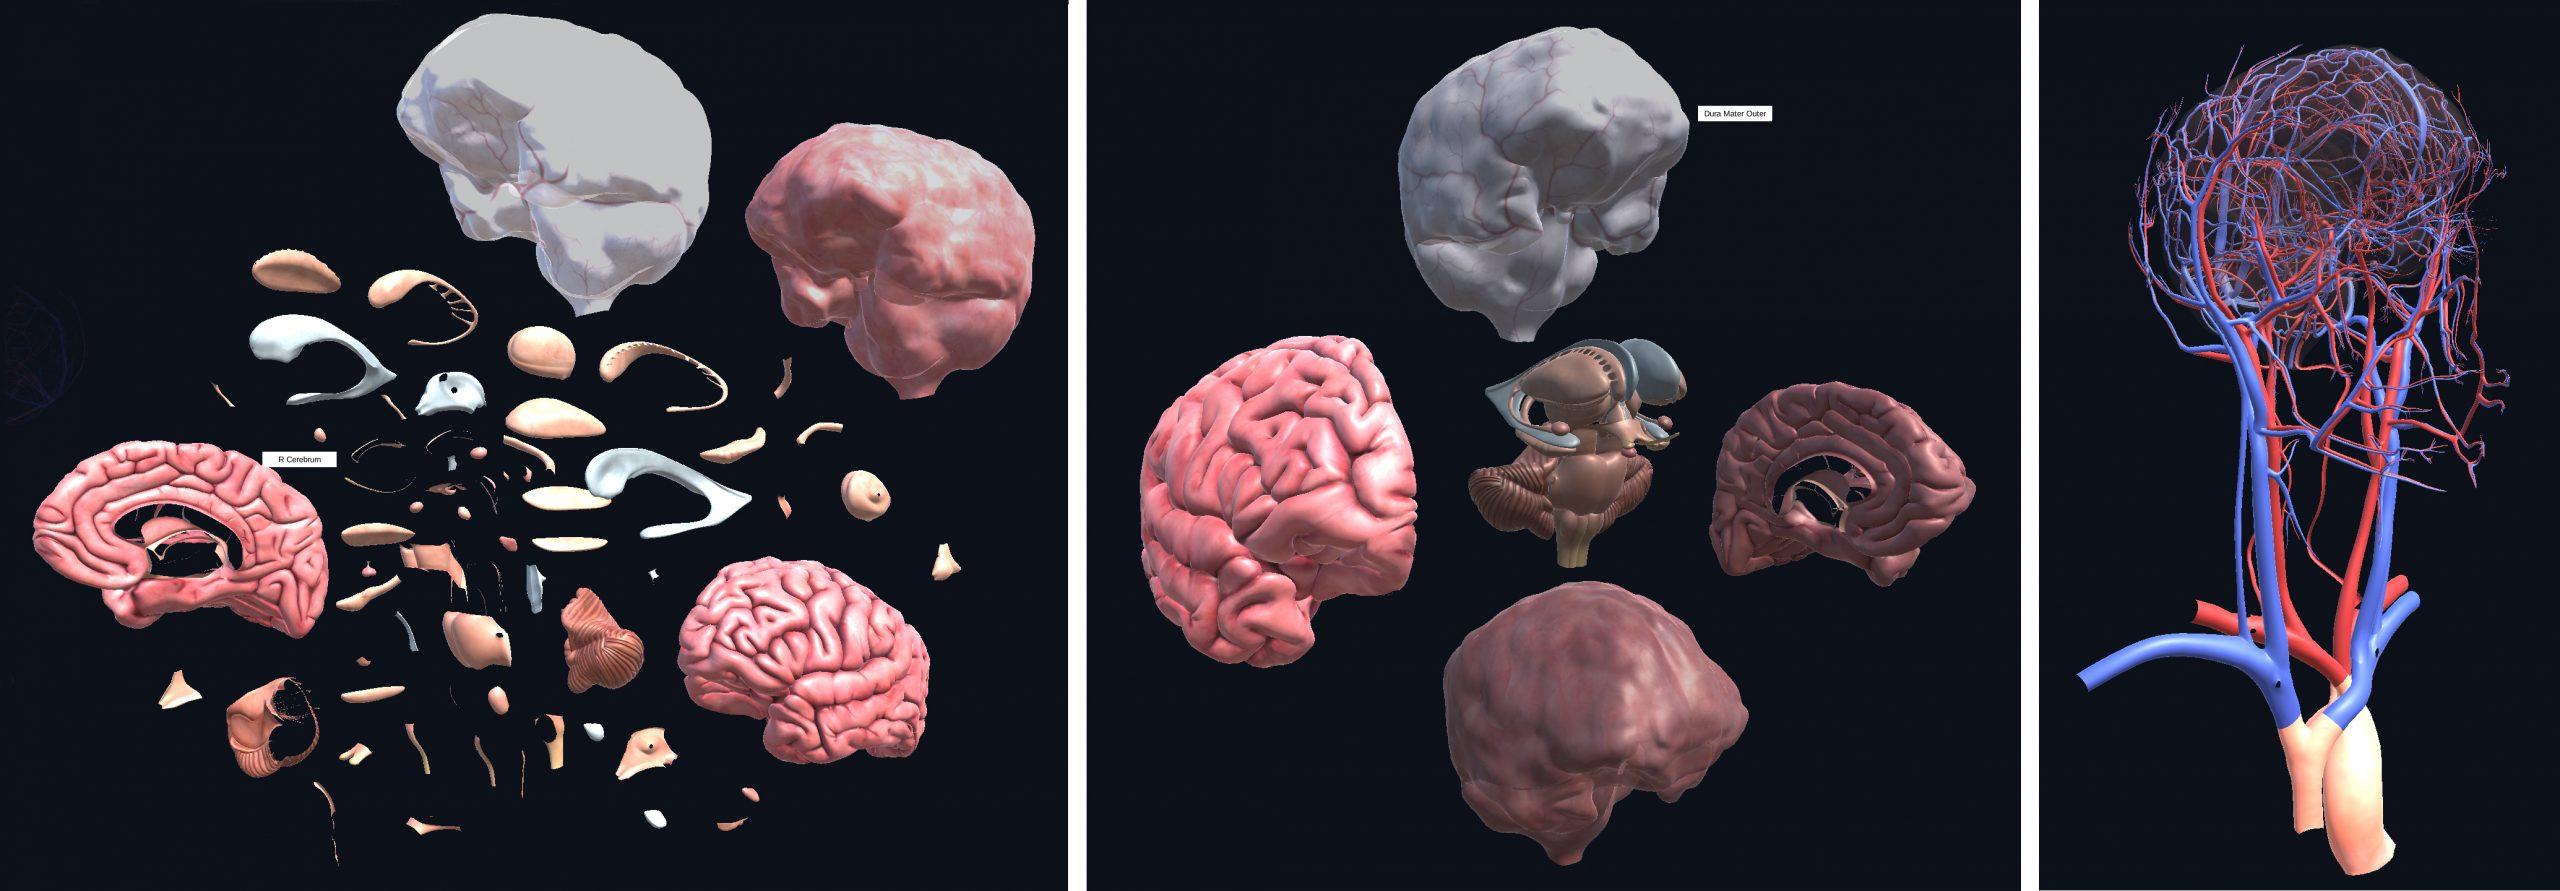 3d views of the brain